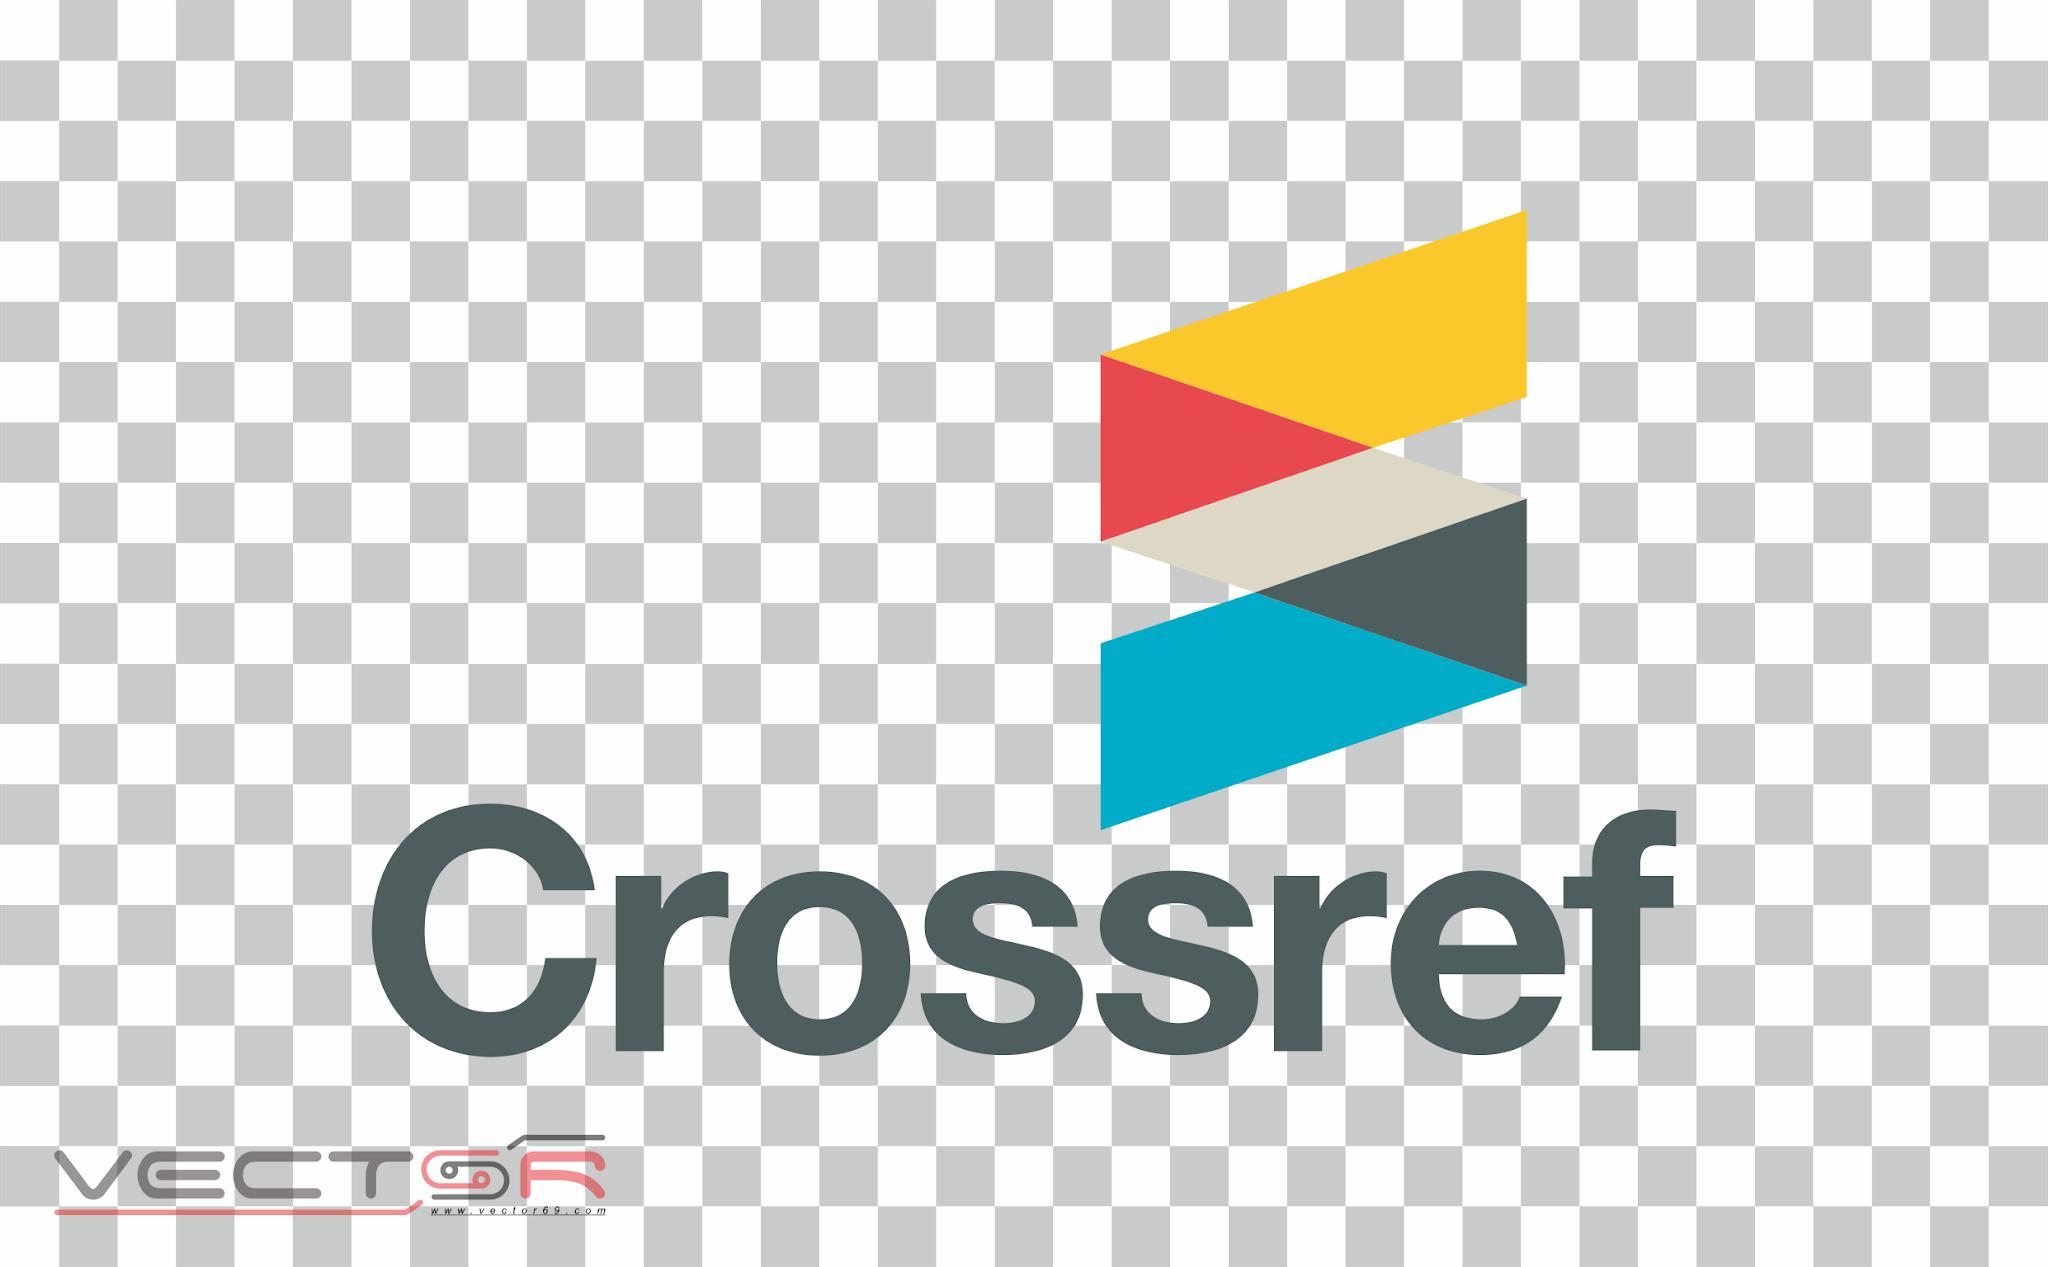 Crossref Logo - Download Vector File PNG (Portable Network Graphics)